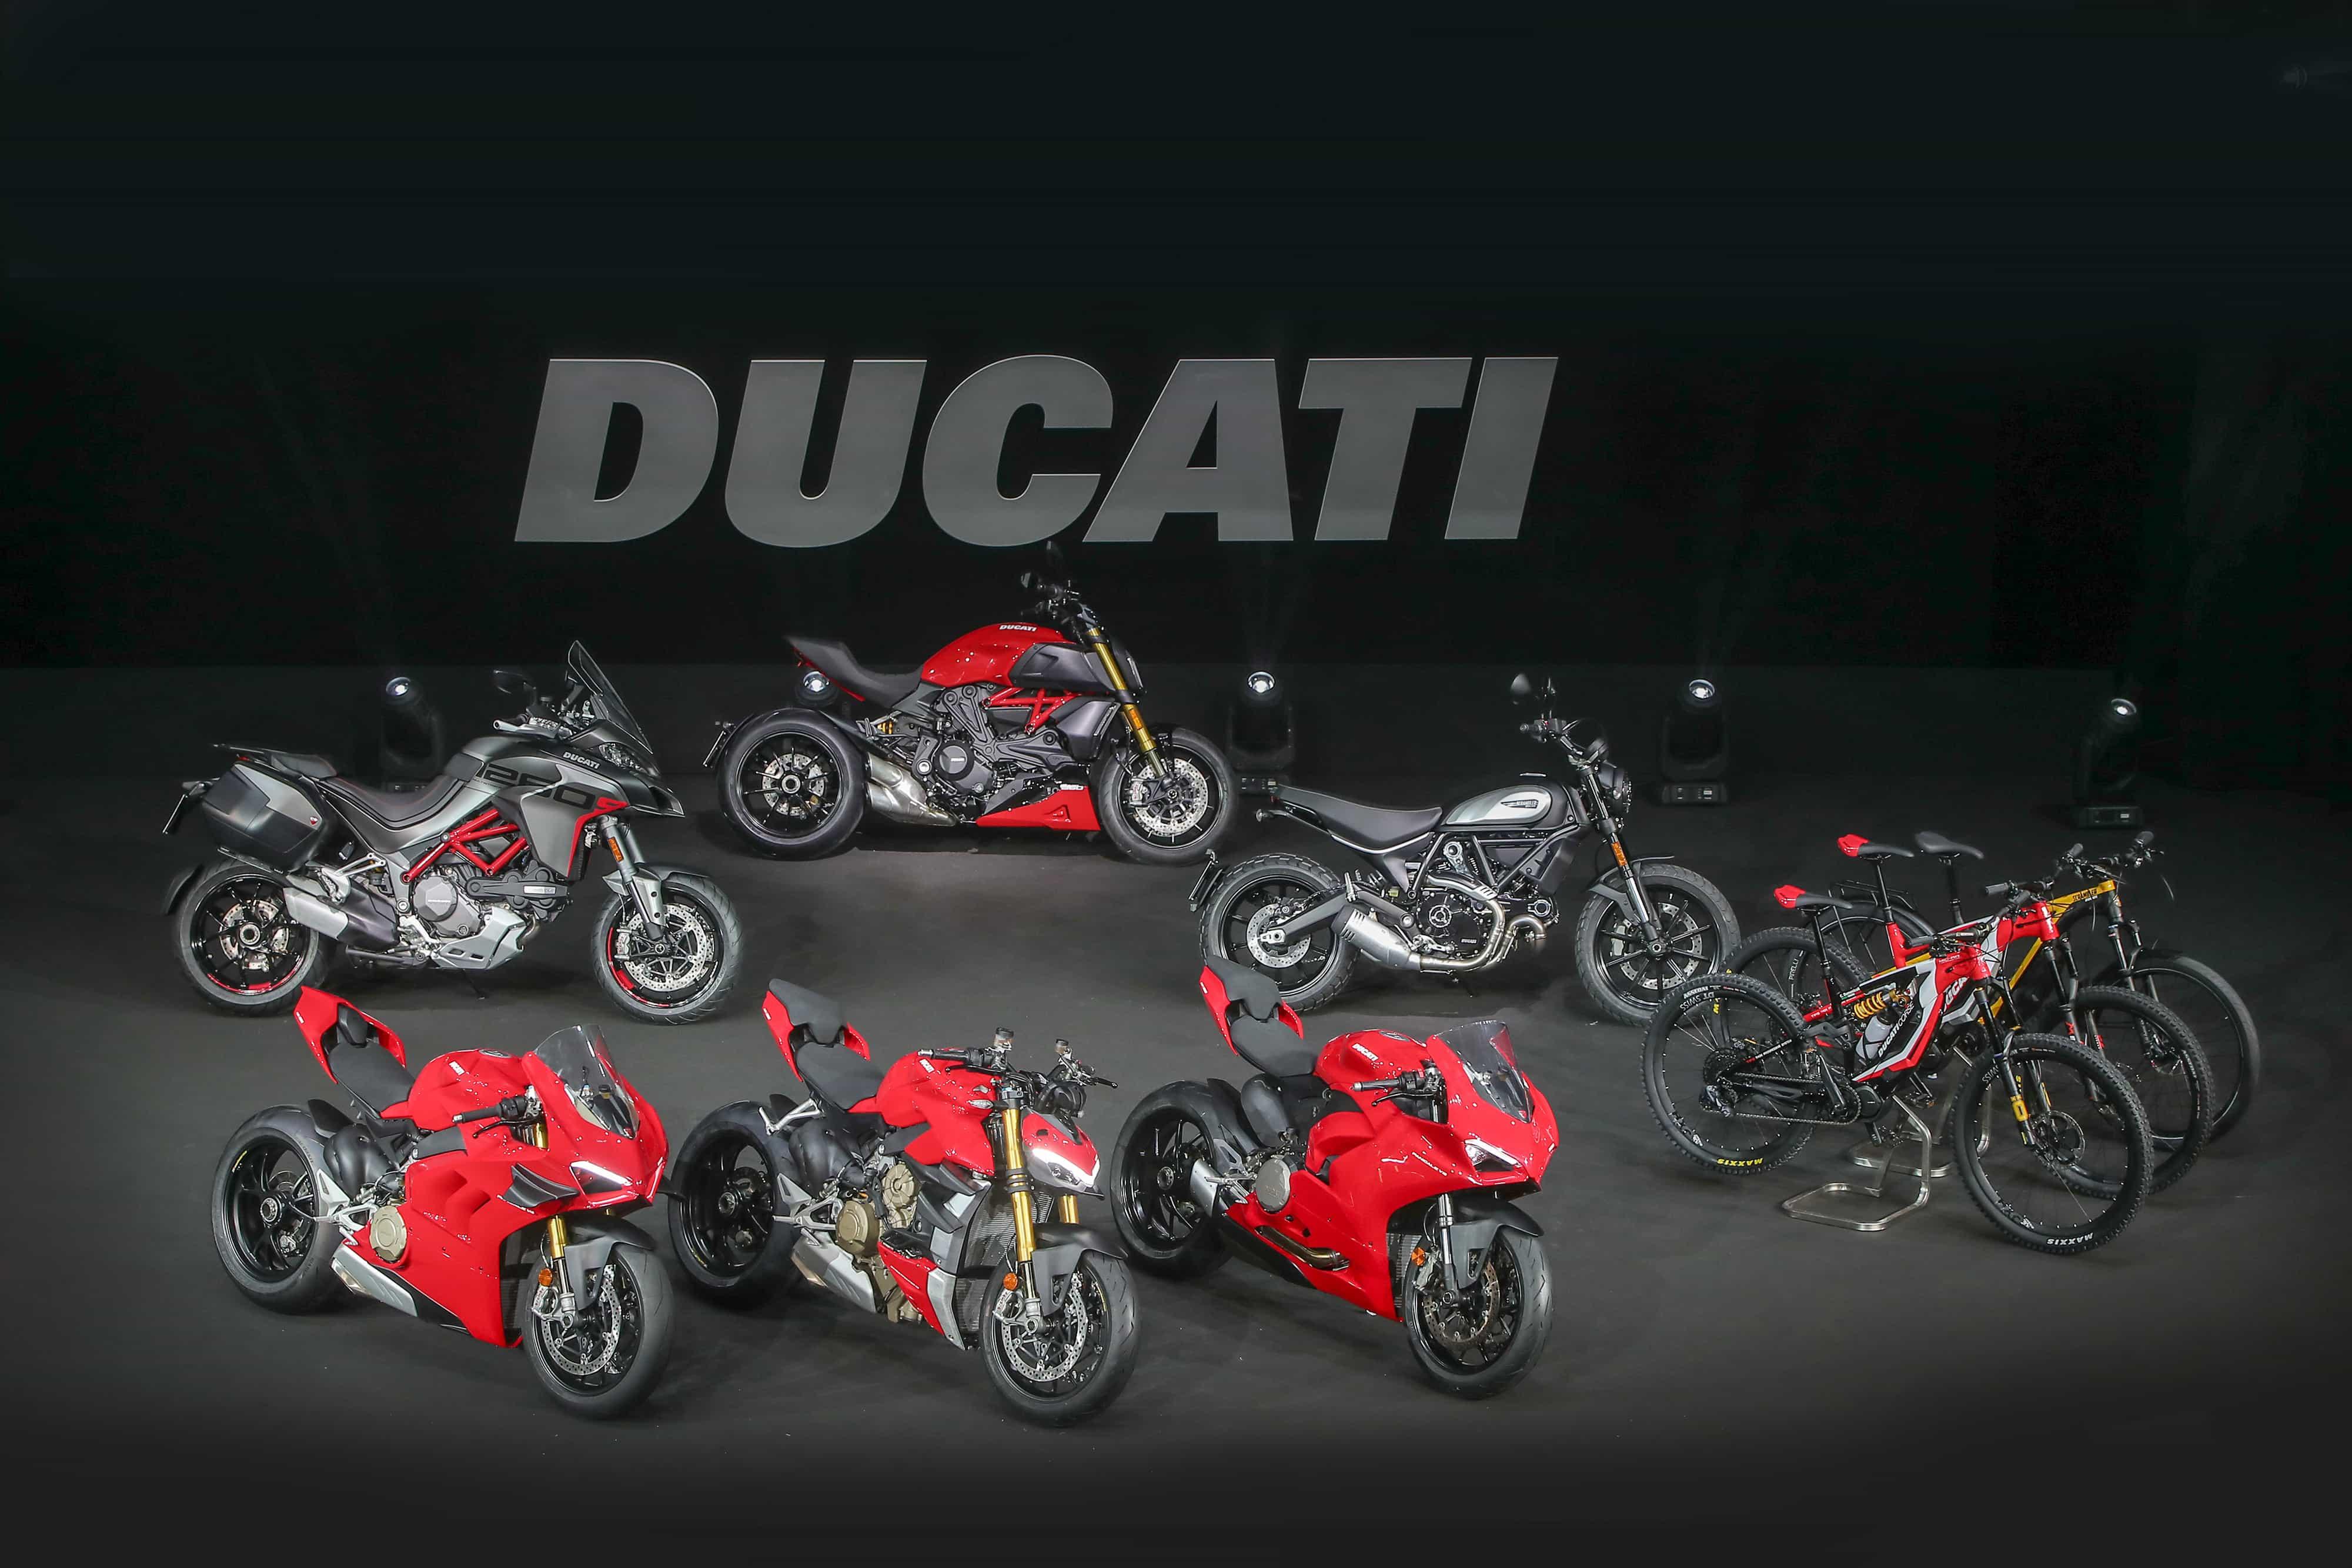 Ducati Ducatiワールドプレミアで2020年の新型車両を公開